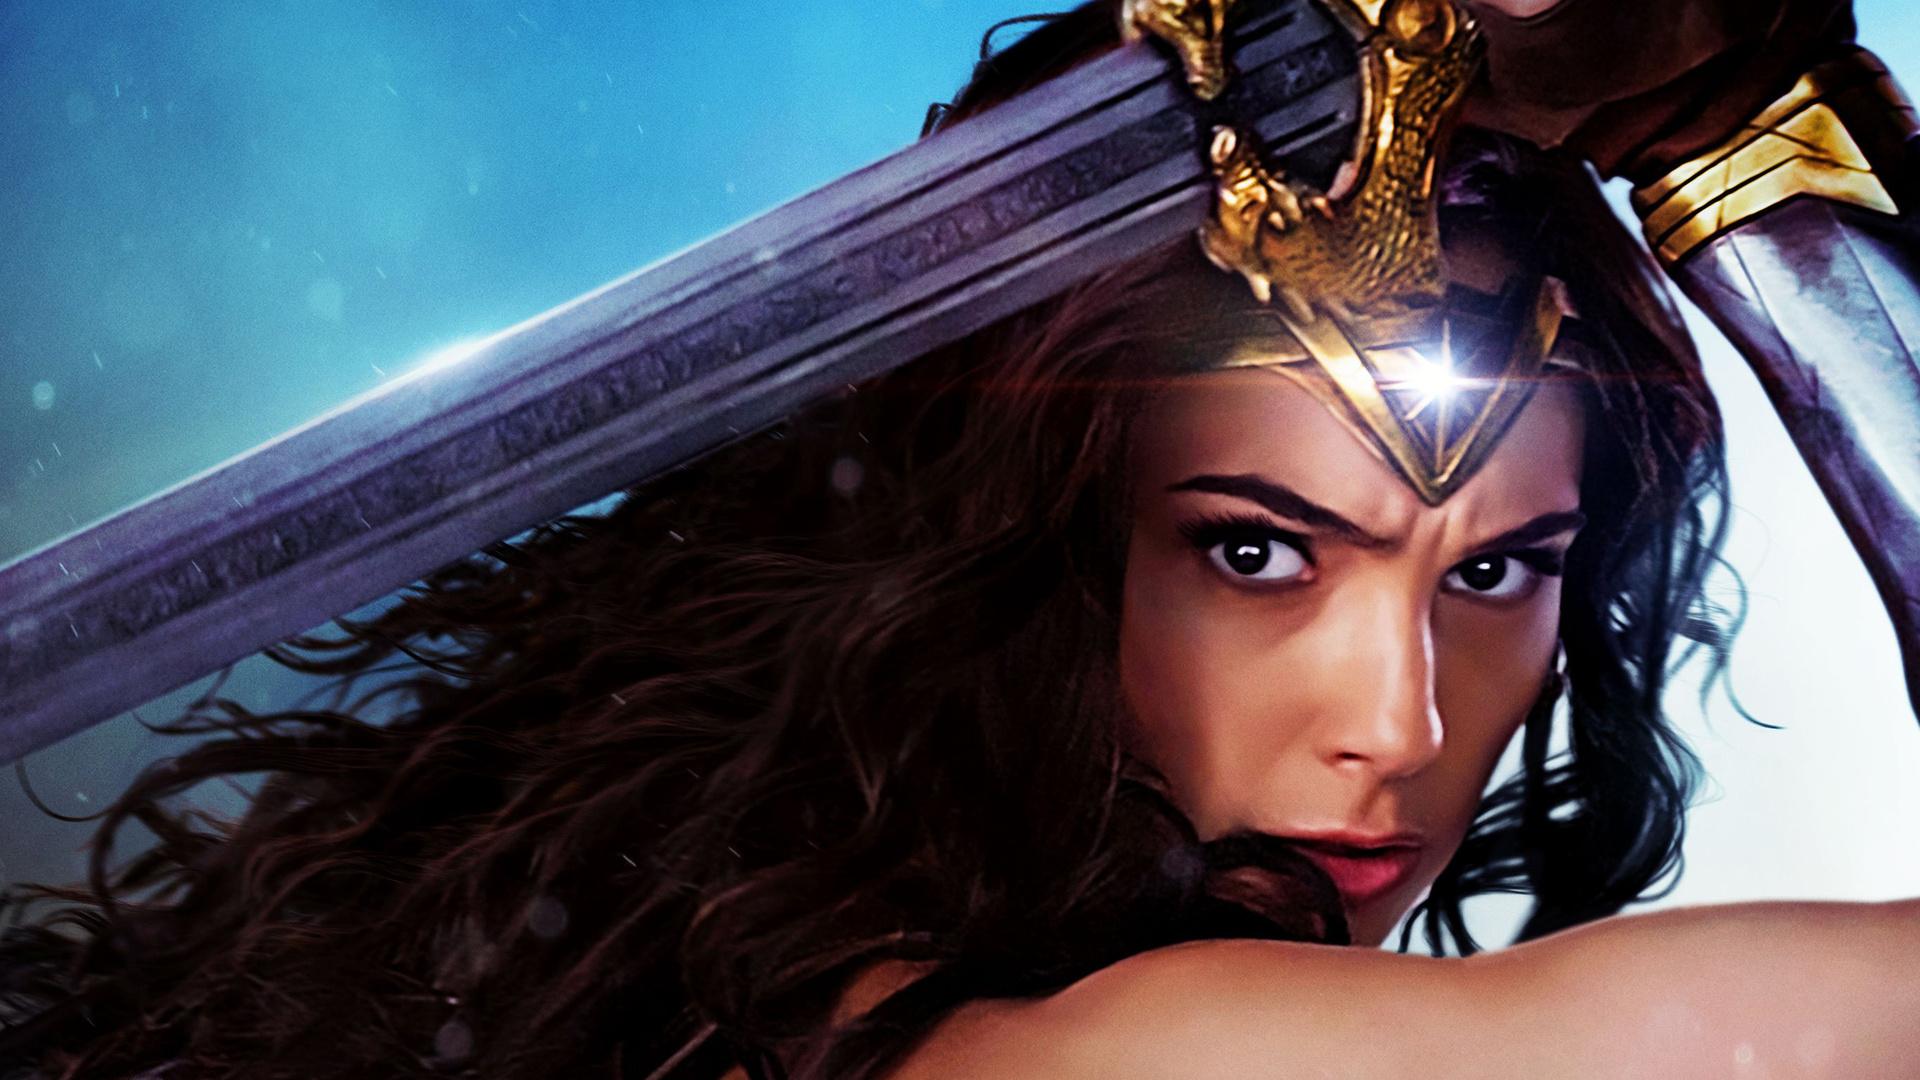 Wonder Woman Movie Wallpaper 1: 1920x1080 Gal Gadot Wonder Woman Movie 2017 Laptop Full HD